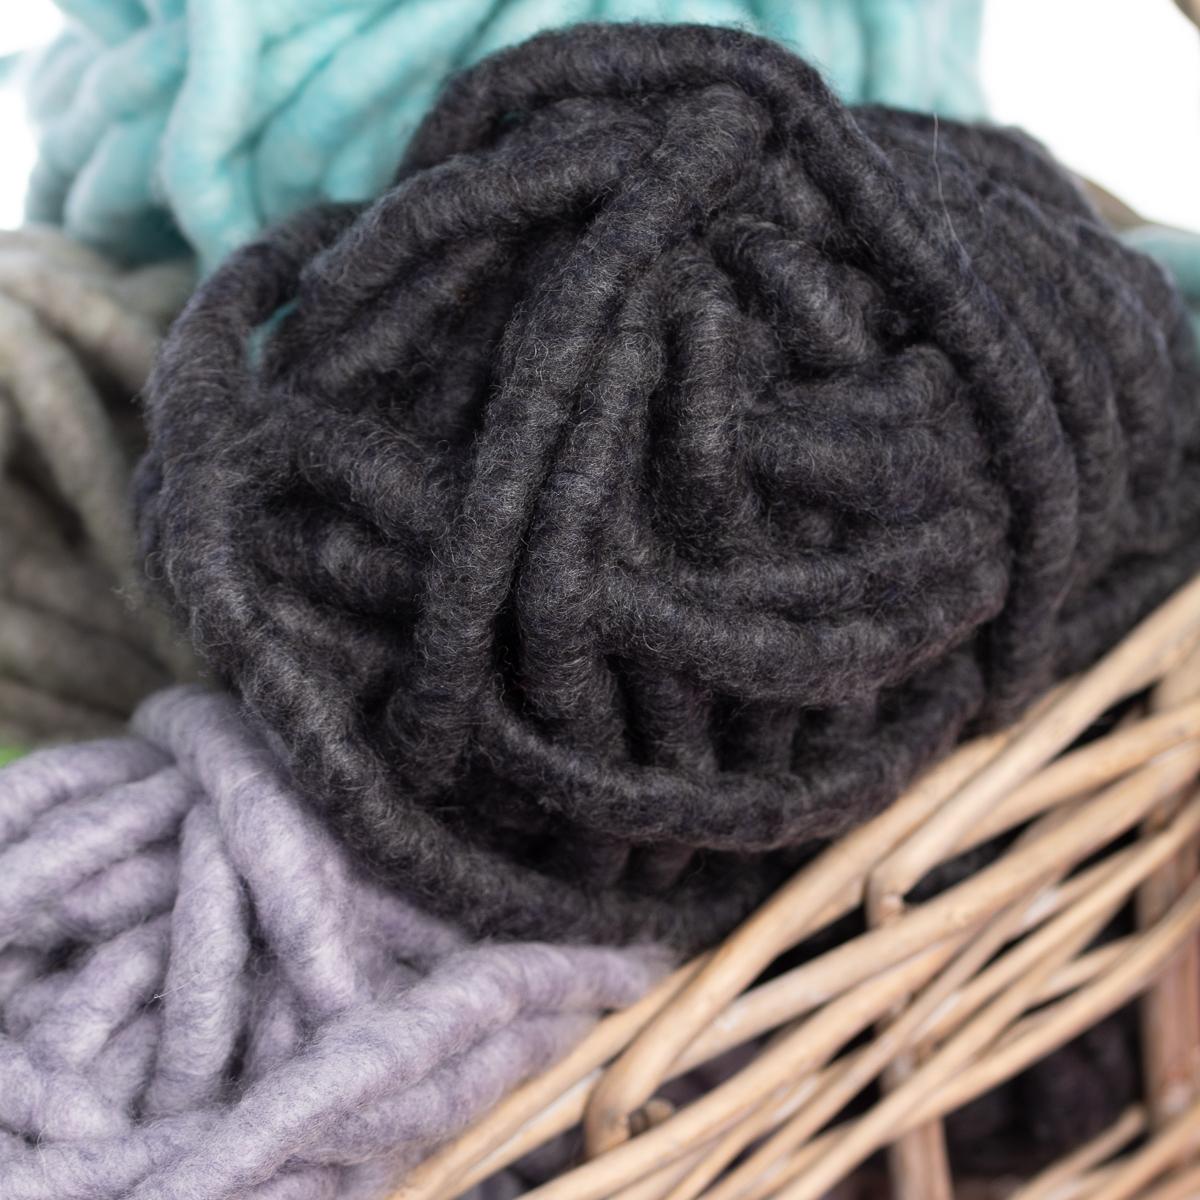 3pk-Lion-Brand-Wow-Acrylic-amp-Wool-yarn-Jumbo-7-Knitting-Crocheting-Skeins-Soft thumbnail 36